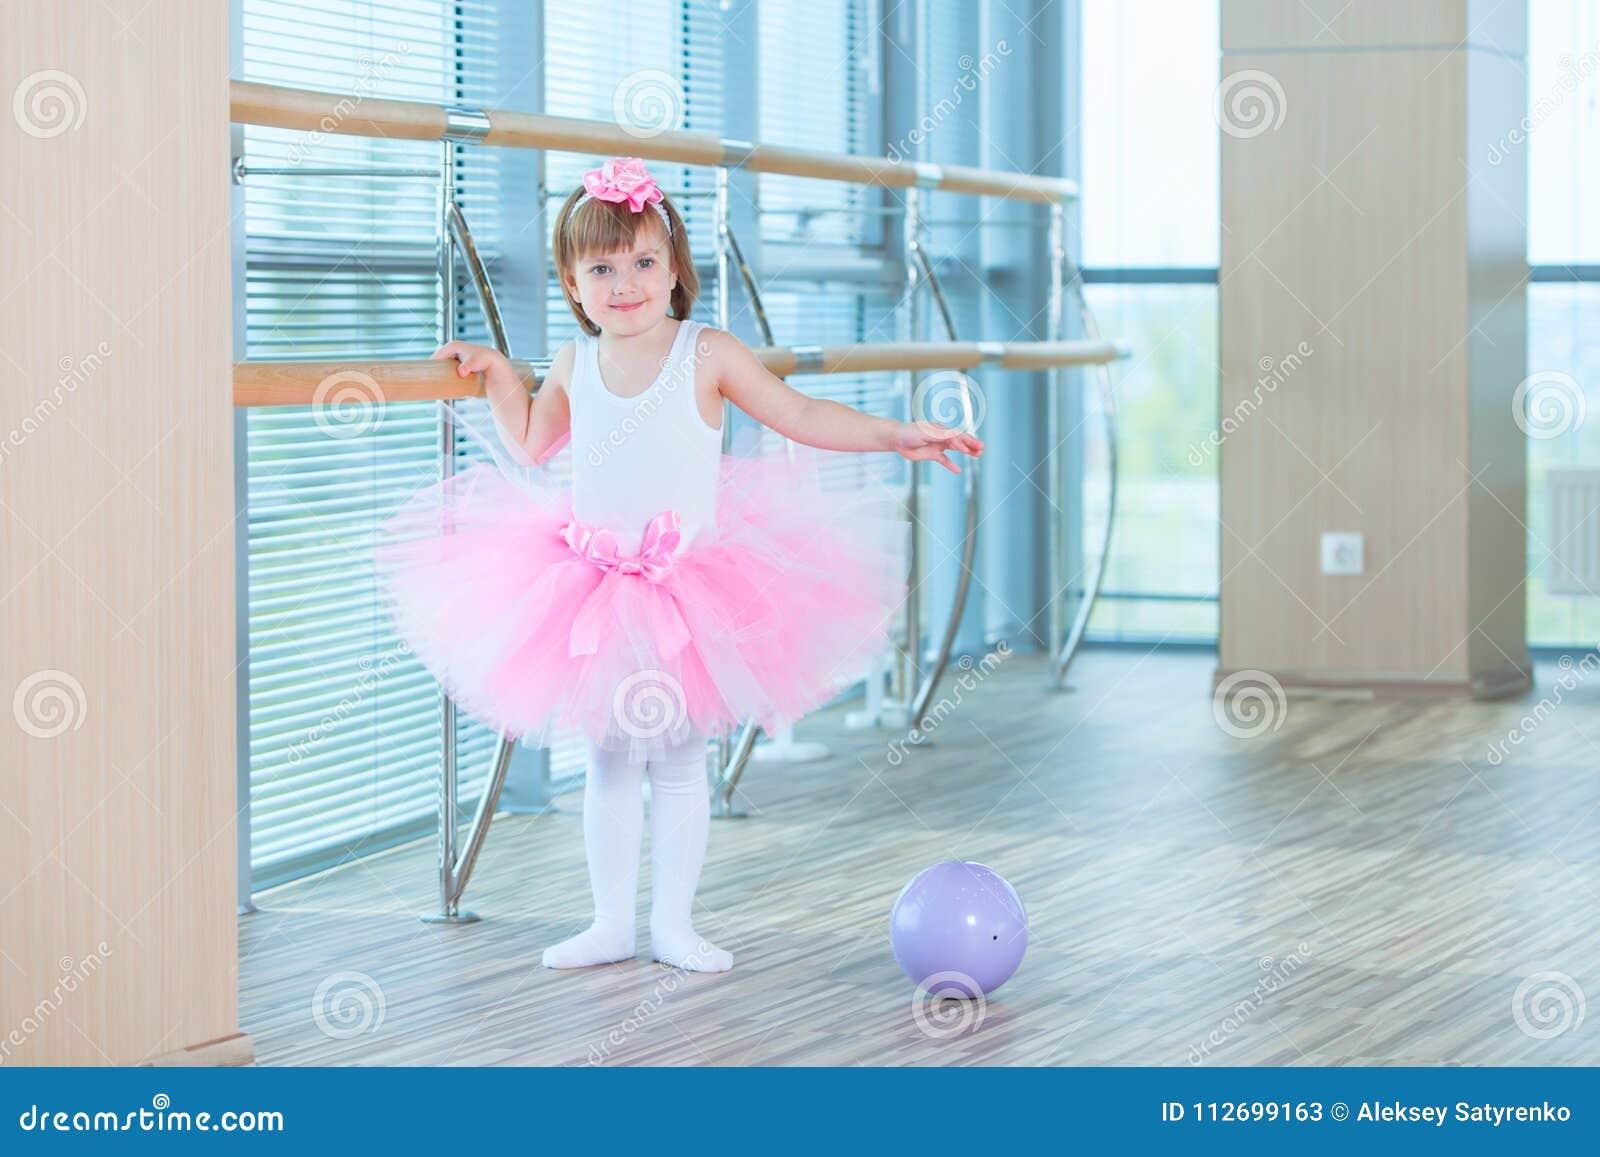 Little ballerina girl in a pink tutu. Adorable child dancing classical ballet in a white studio. Children dance. Kids